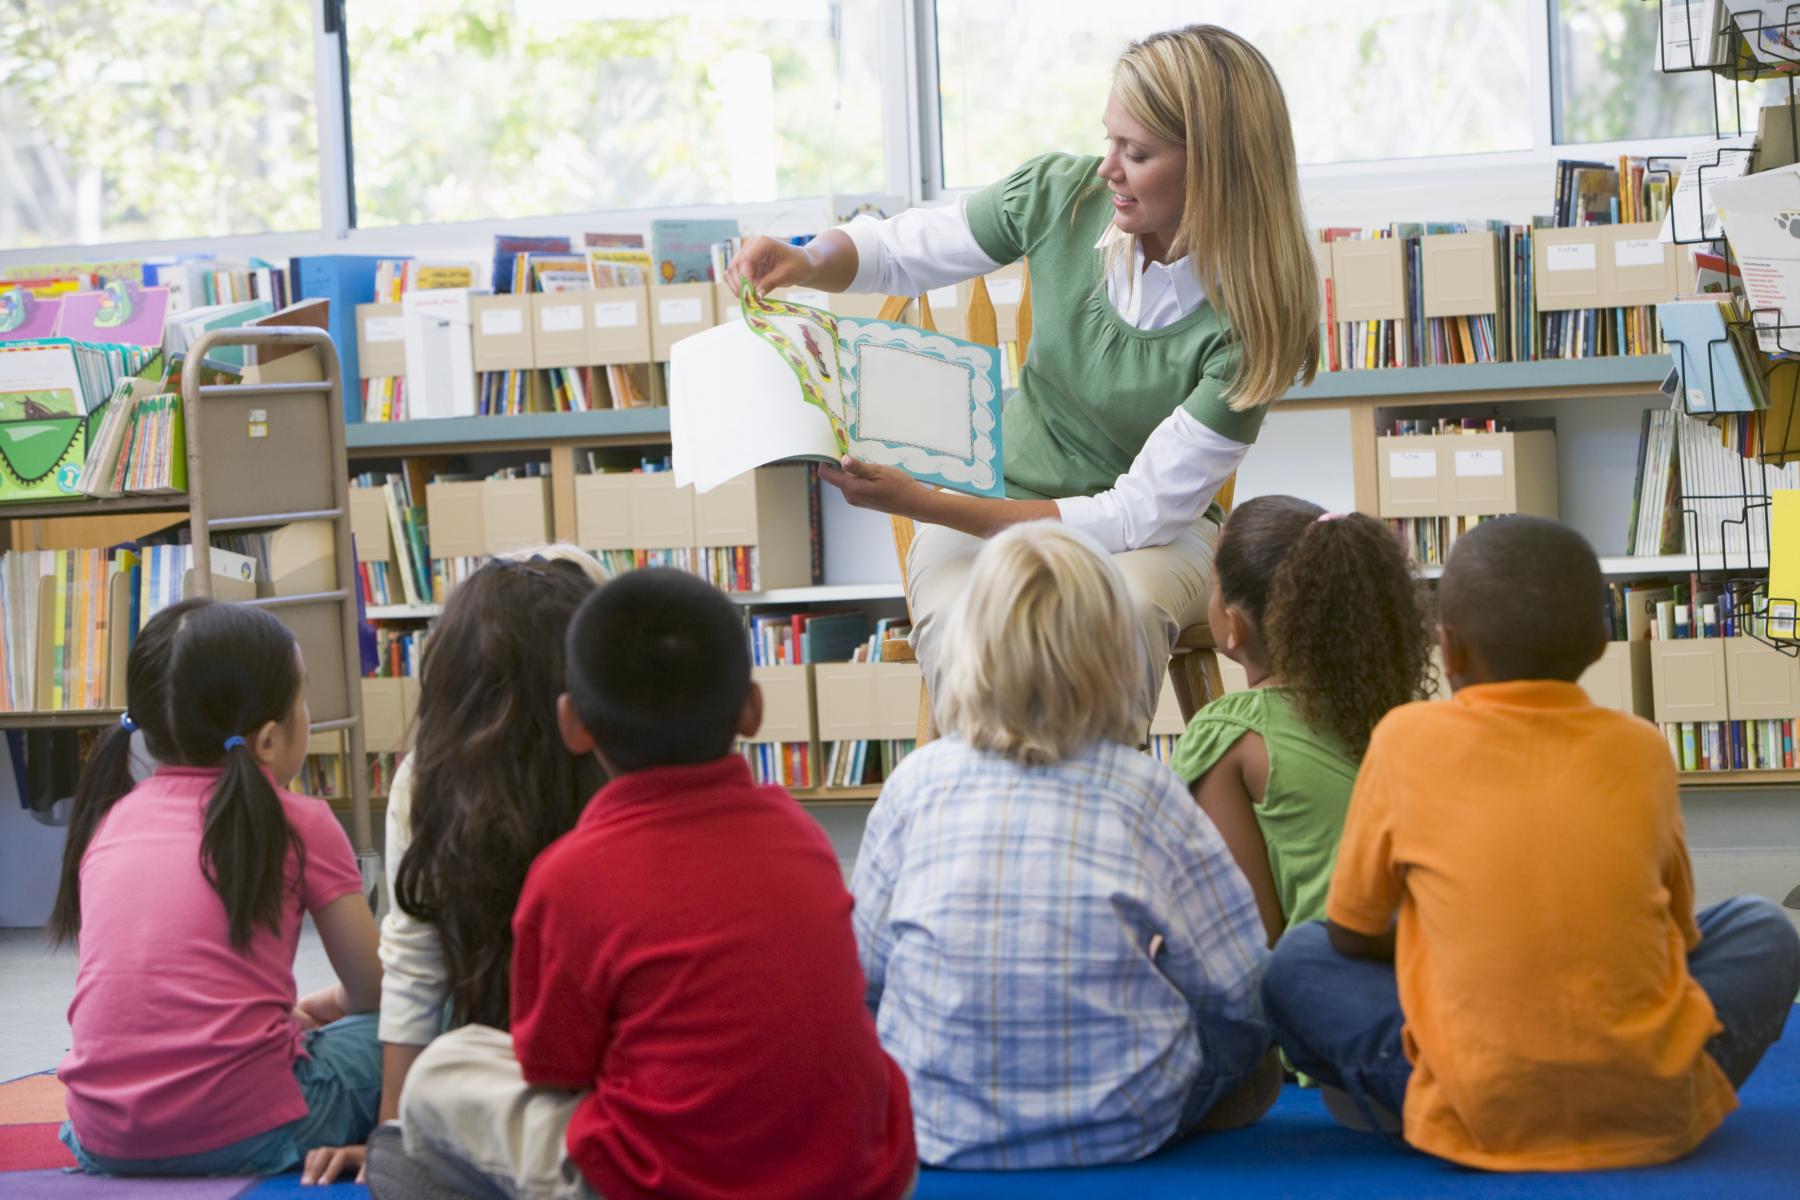 2126420-kindergarten-teacher-reading-to-children-in-library